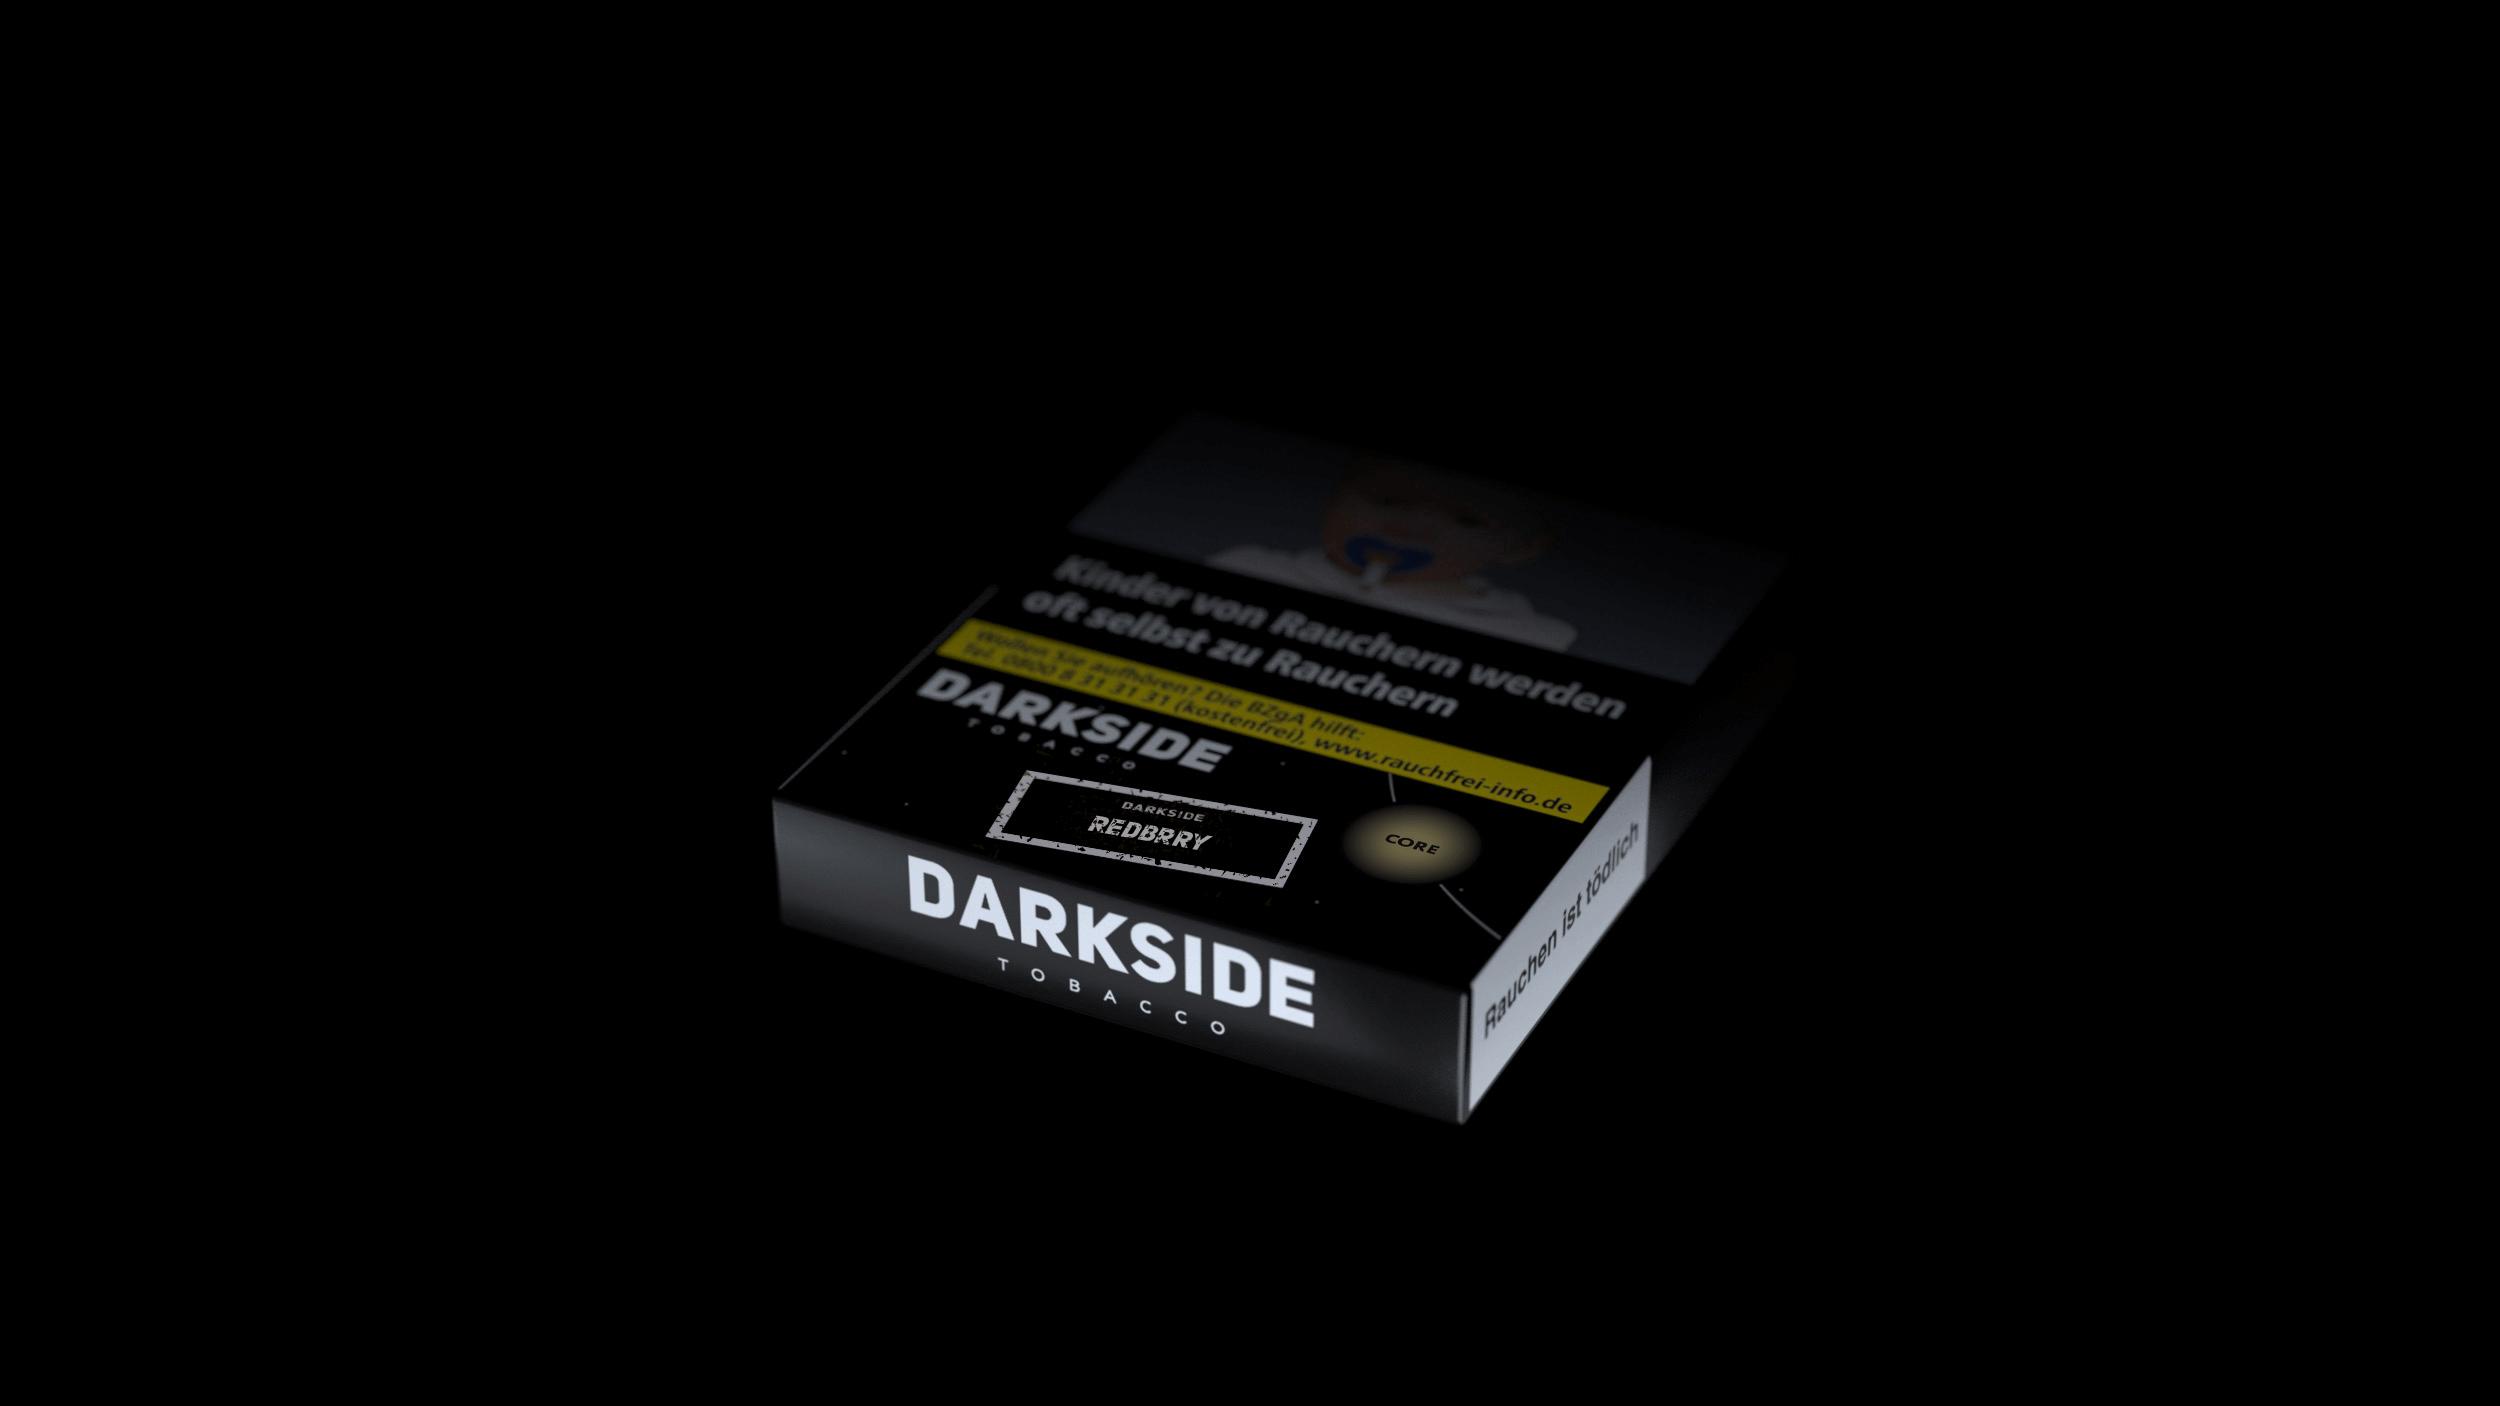 Darkside Redbrry Core 200g